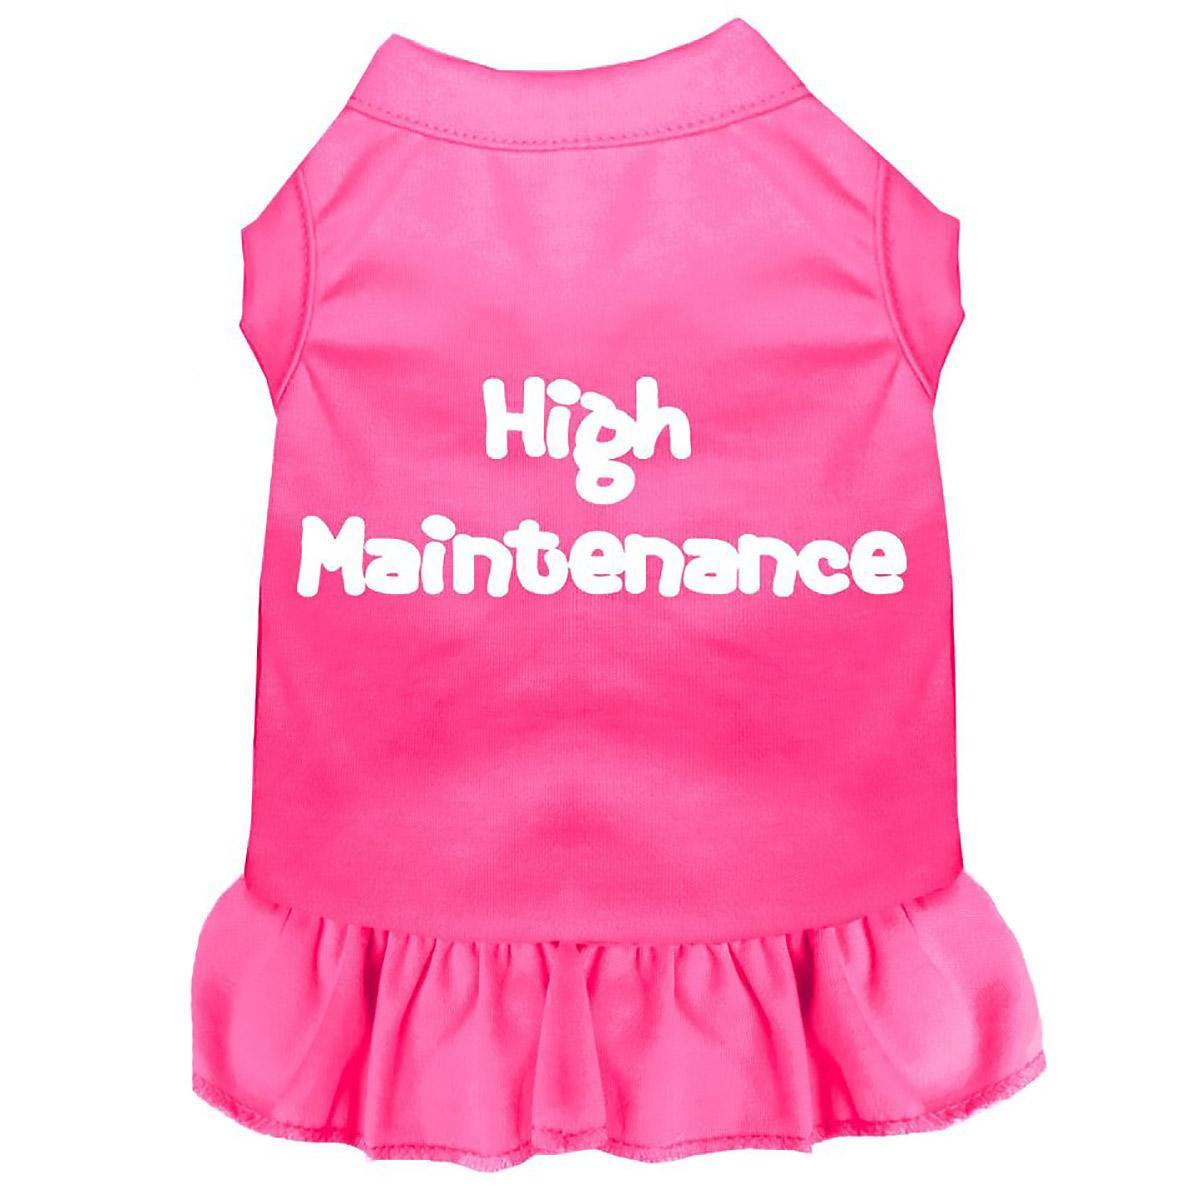 High Maintenance Screen Print Dog Dress - Bright Pink